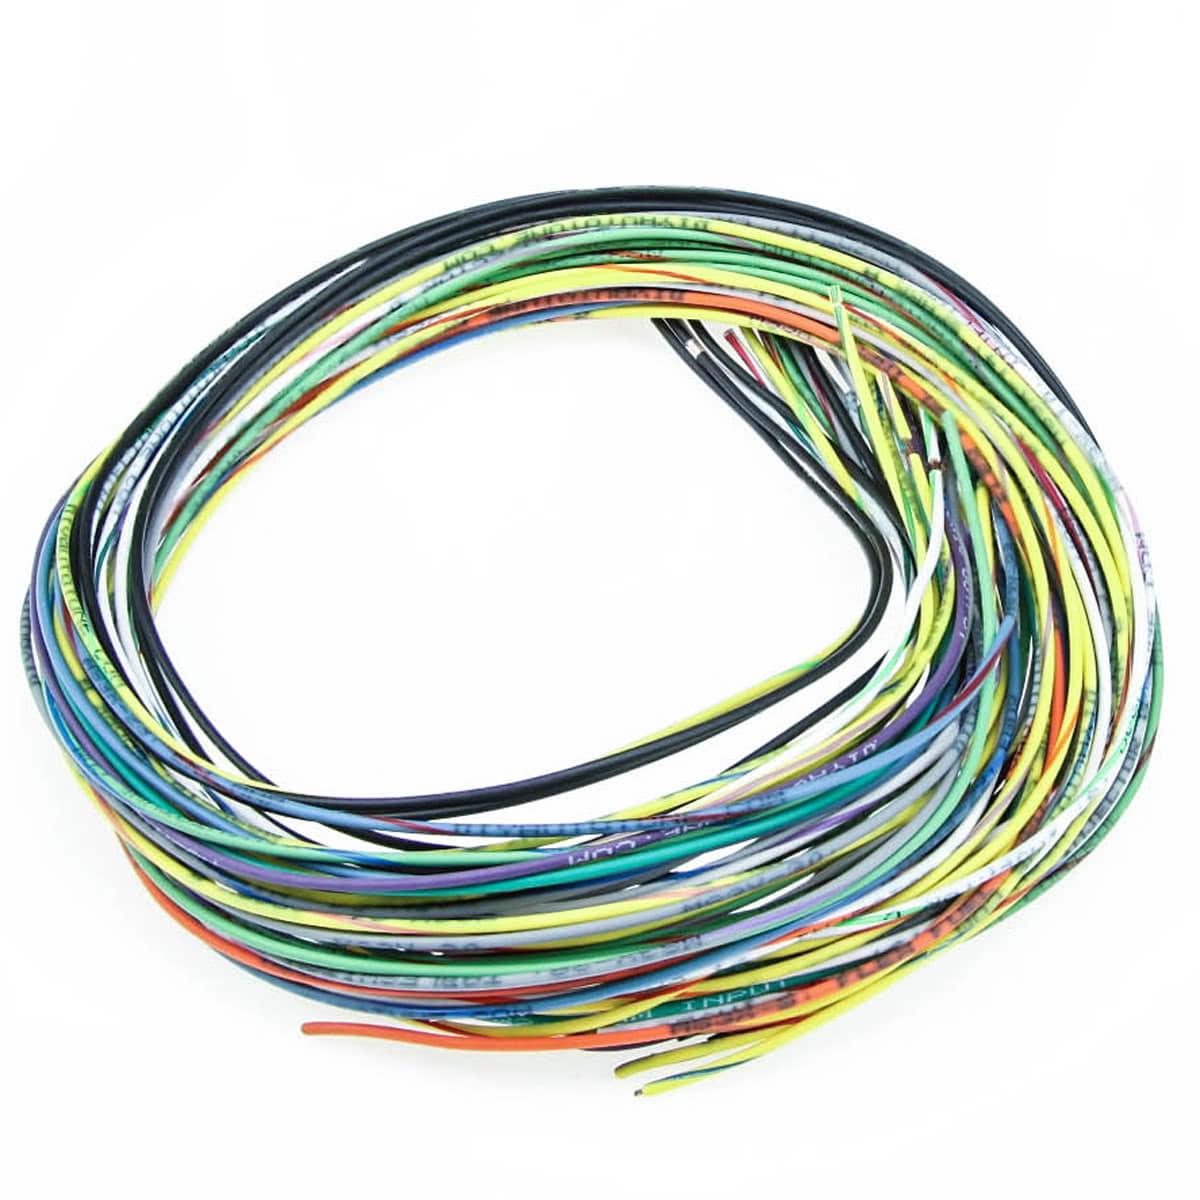 23 Megasquirt Wiring Bundle For Ms3x Automotive Harness Labels